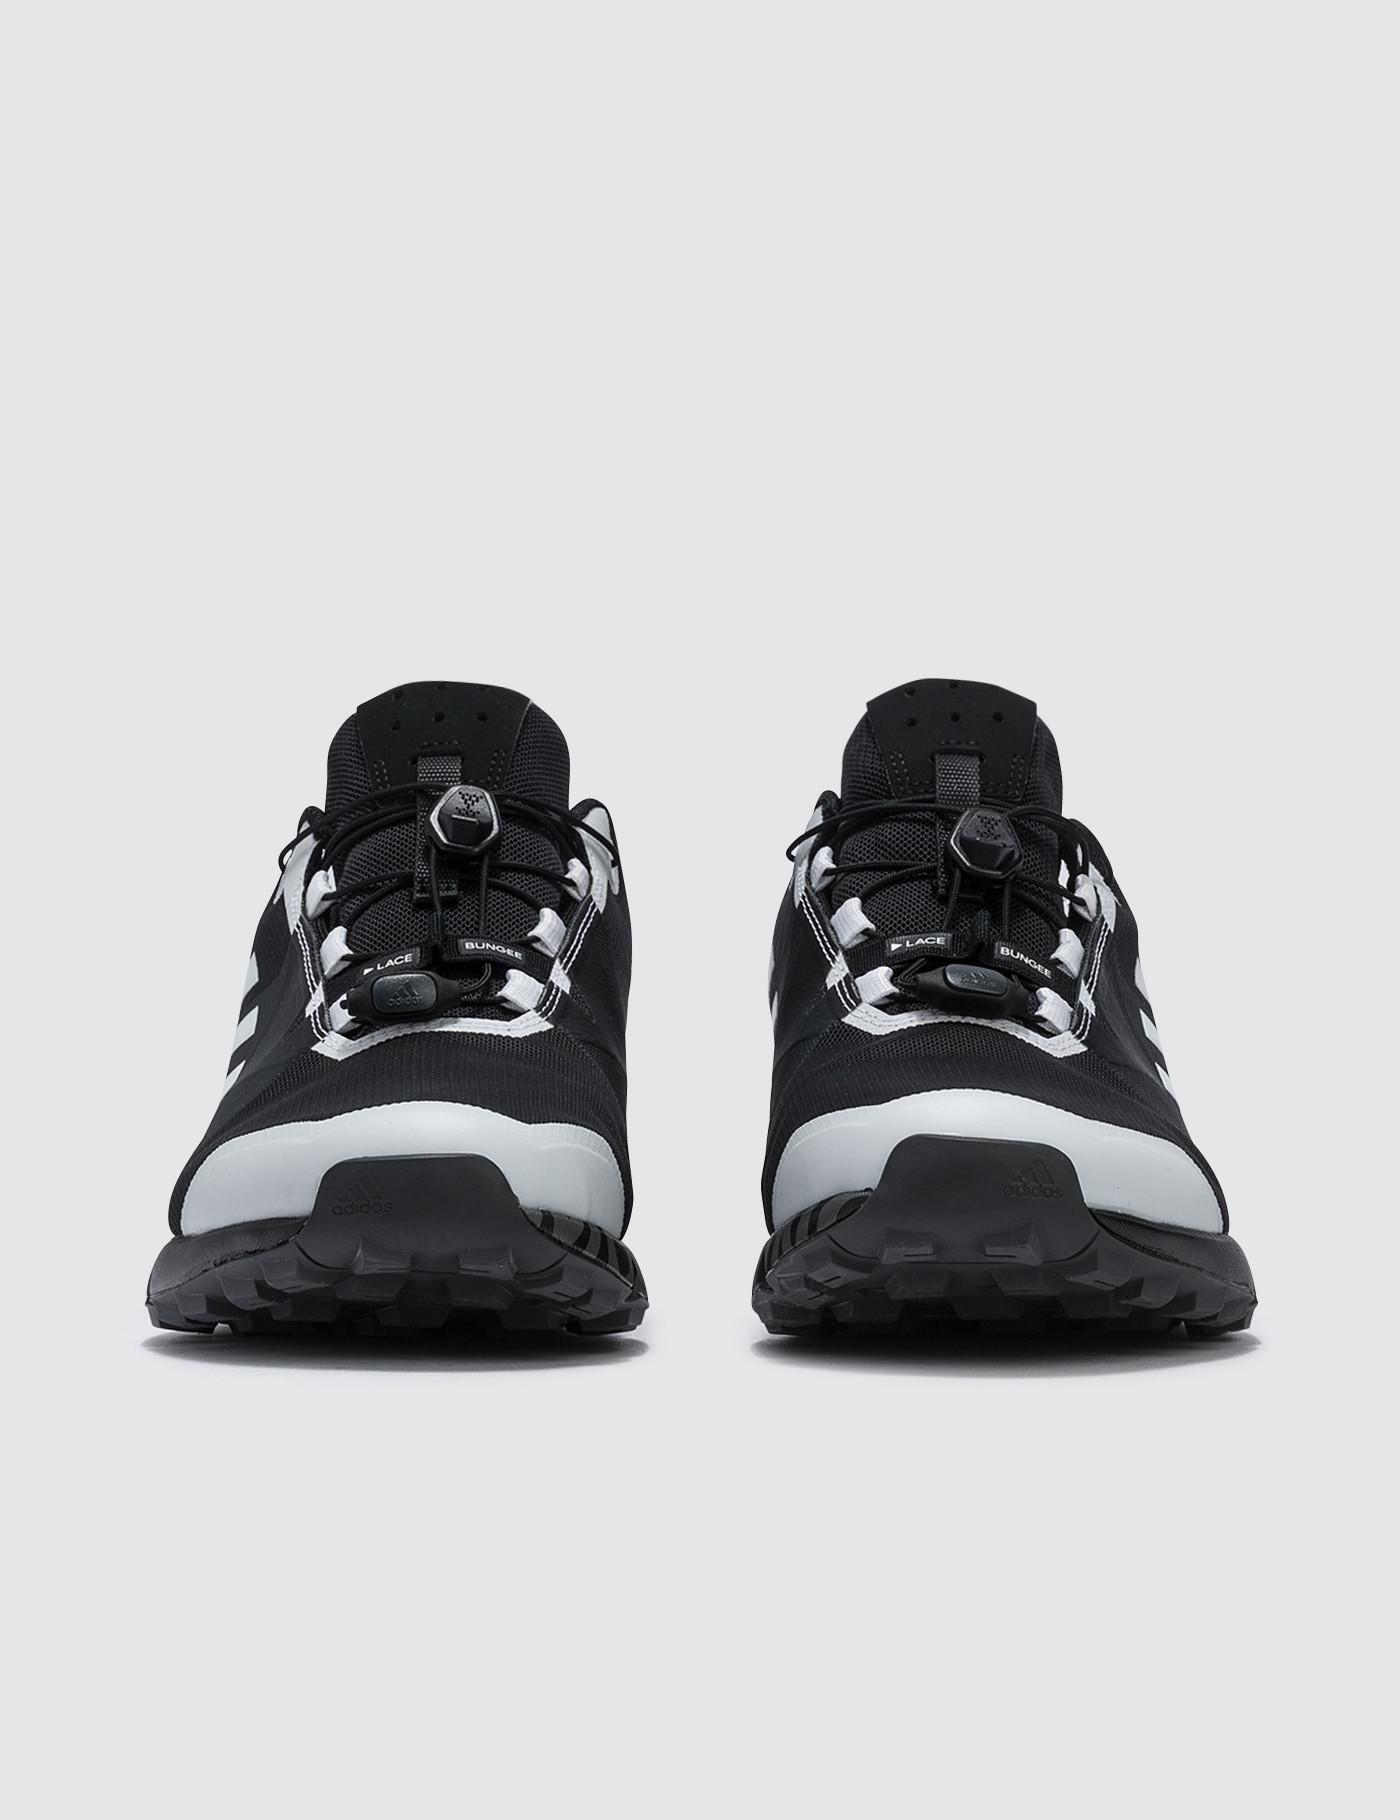 109c3d5e2b5c Adidas Originals White Mountaineering X Adidas Terrex Two Gtx in Black for  Men - Lyst